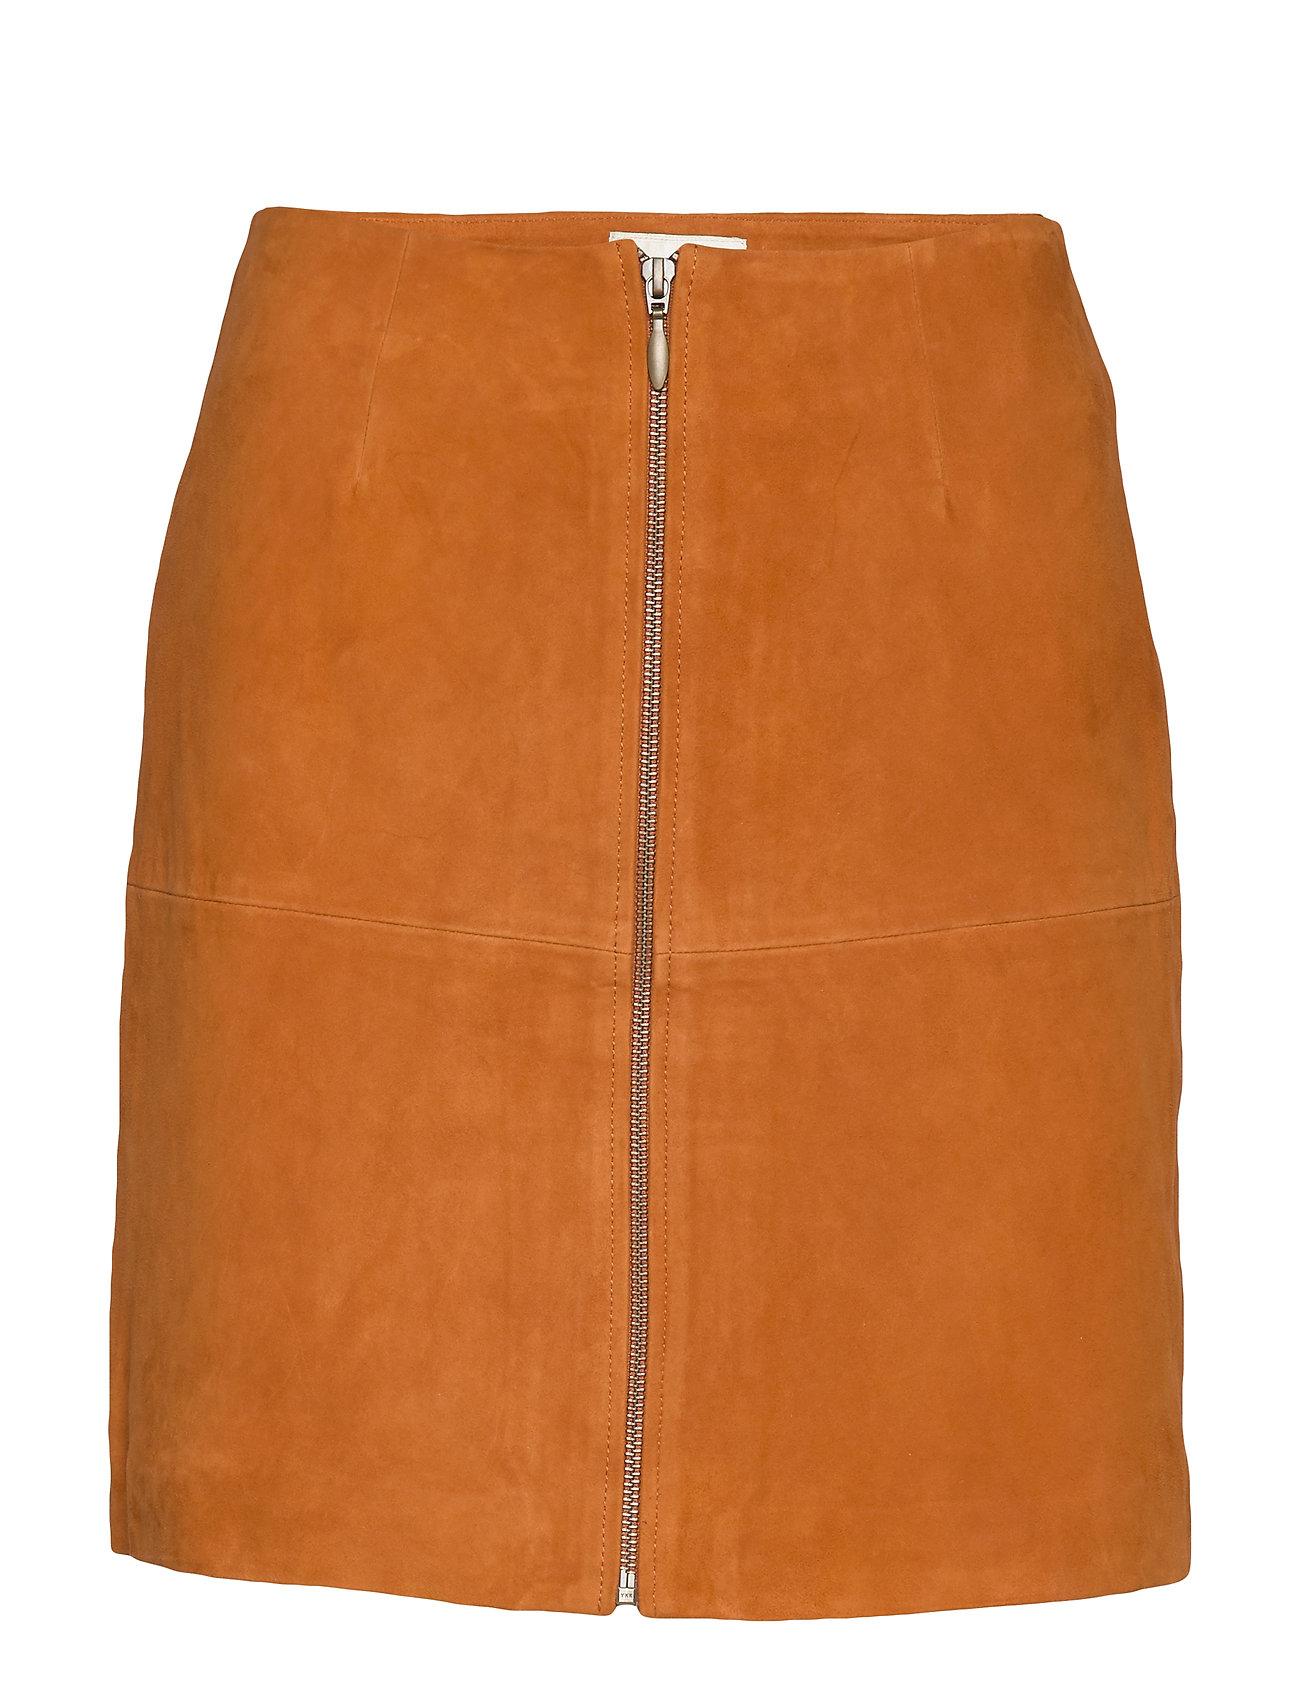 Image of Leather Skirt Short Kort Nederdel Orange MAUD (3406239635)